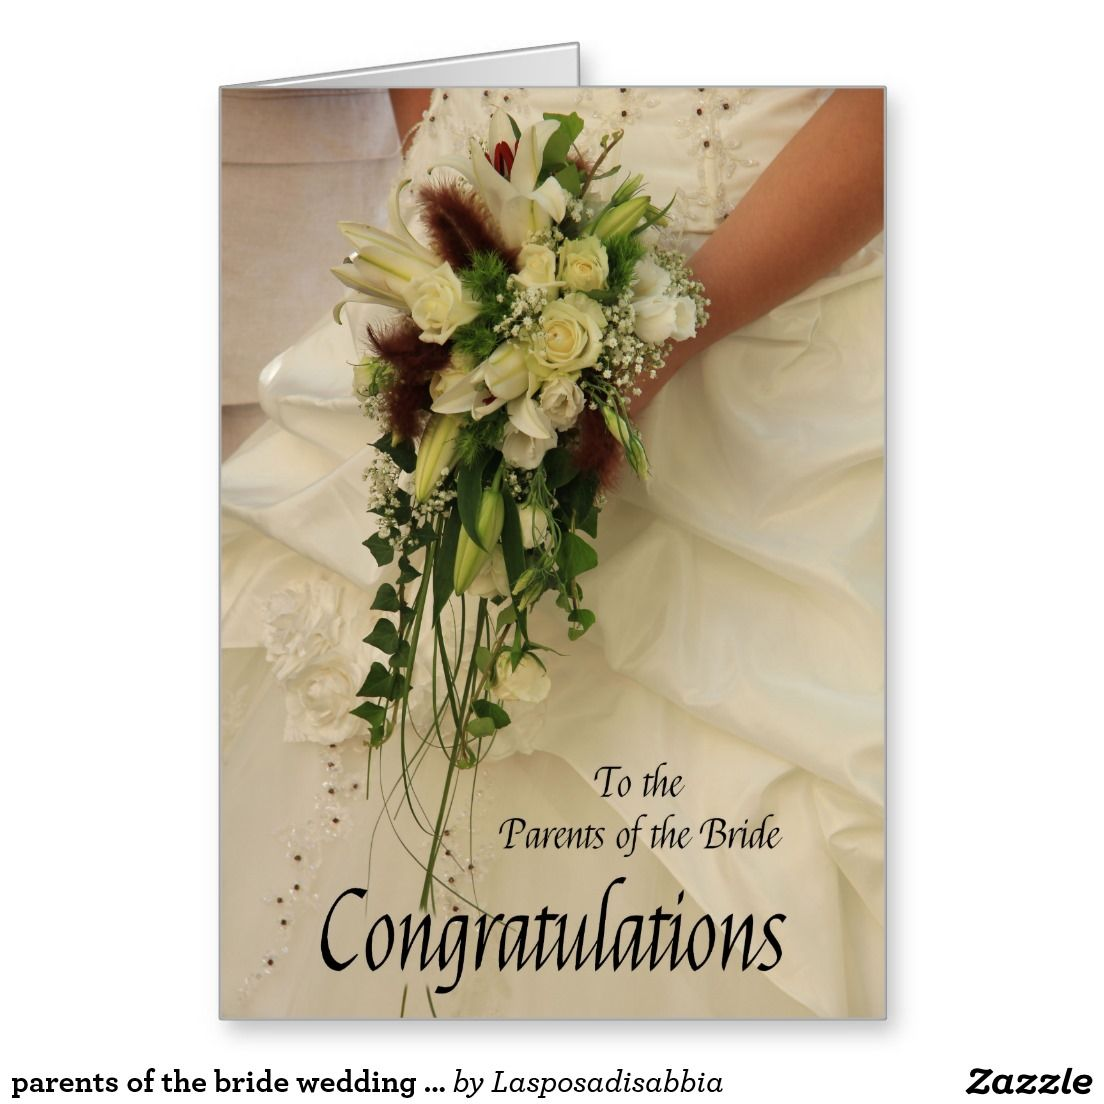 Parents of the bride wedding congratulations greeting card all parents of the bride wedding congratulations greeting card m4hsunfo